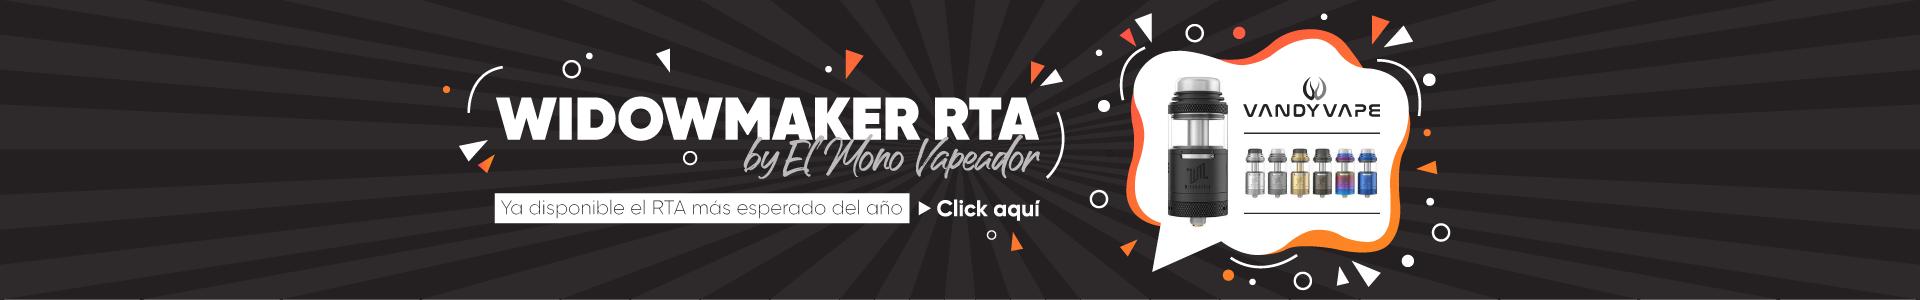 Comprar Vandy Vape Widowmaker RTA by El Mono Vapeador Barato